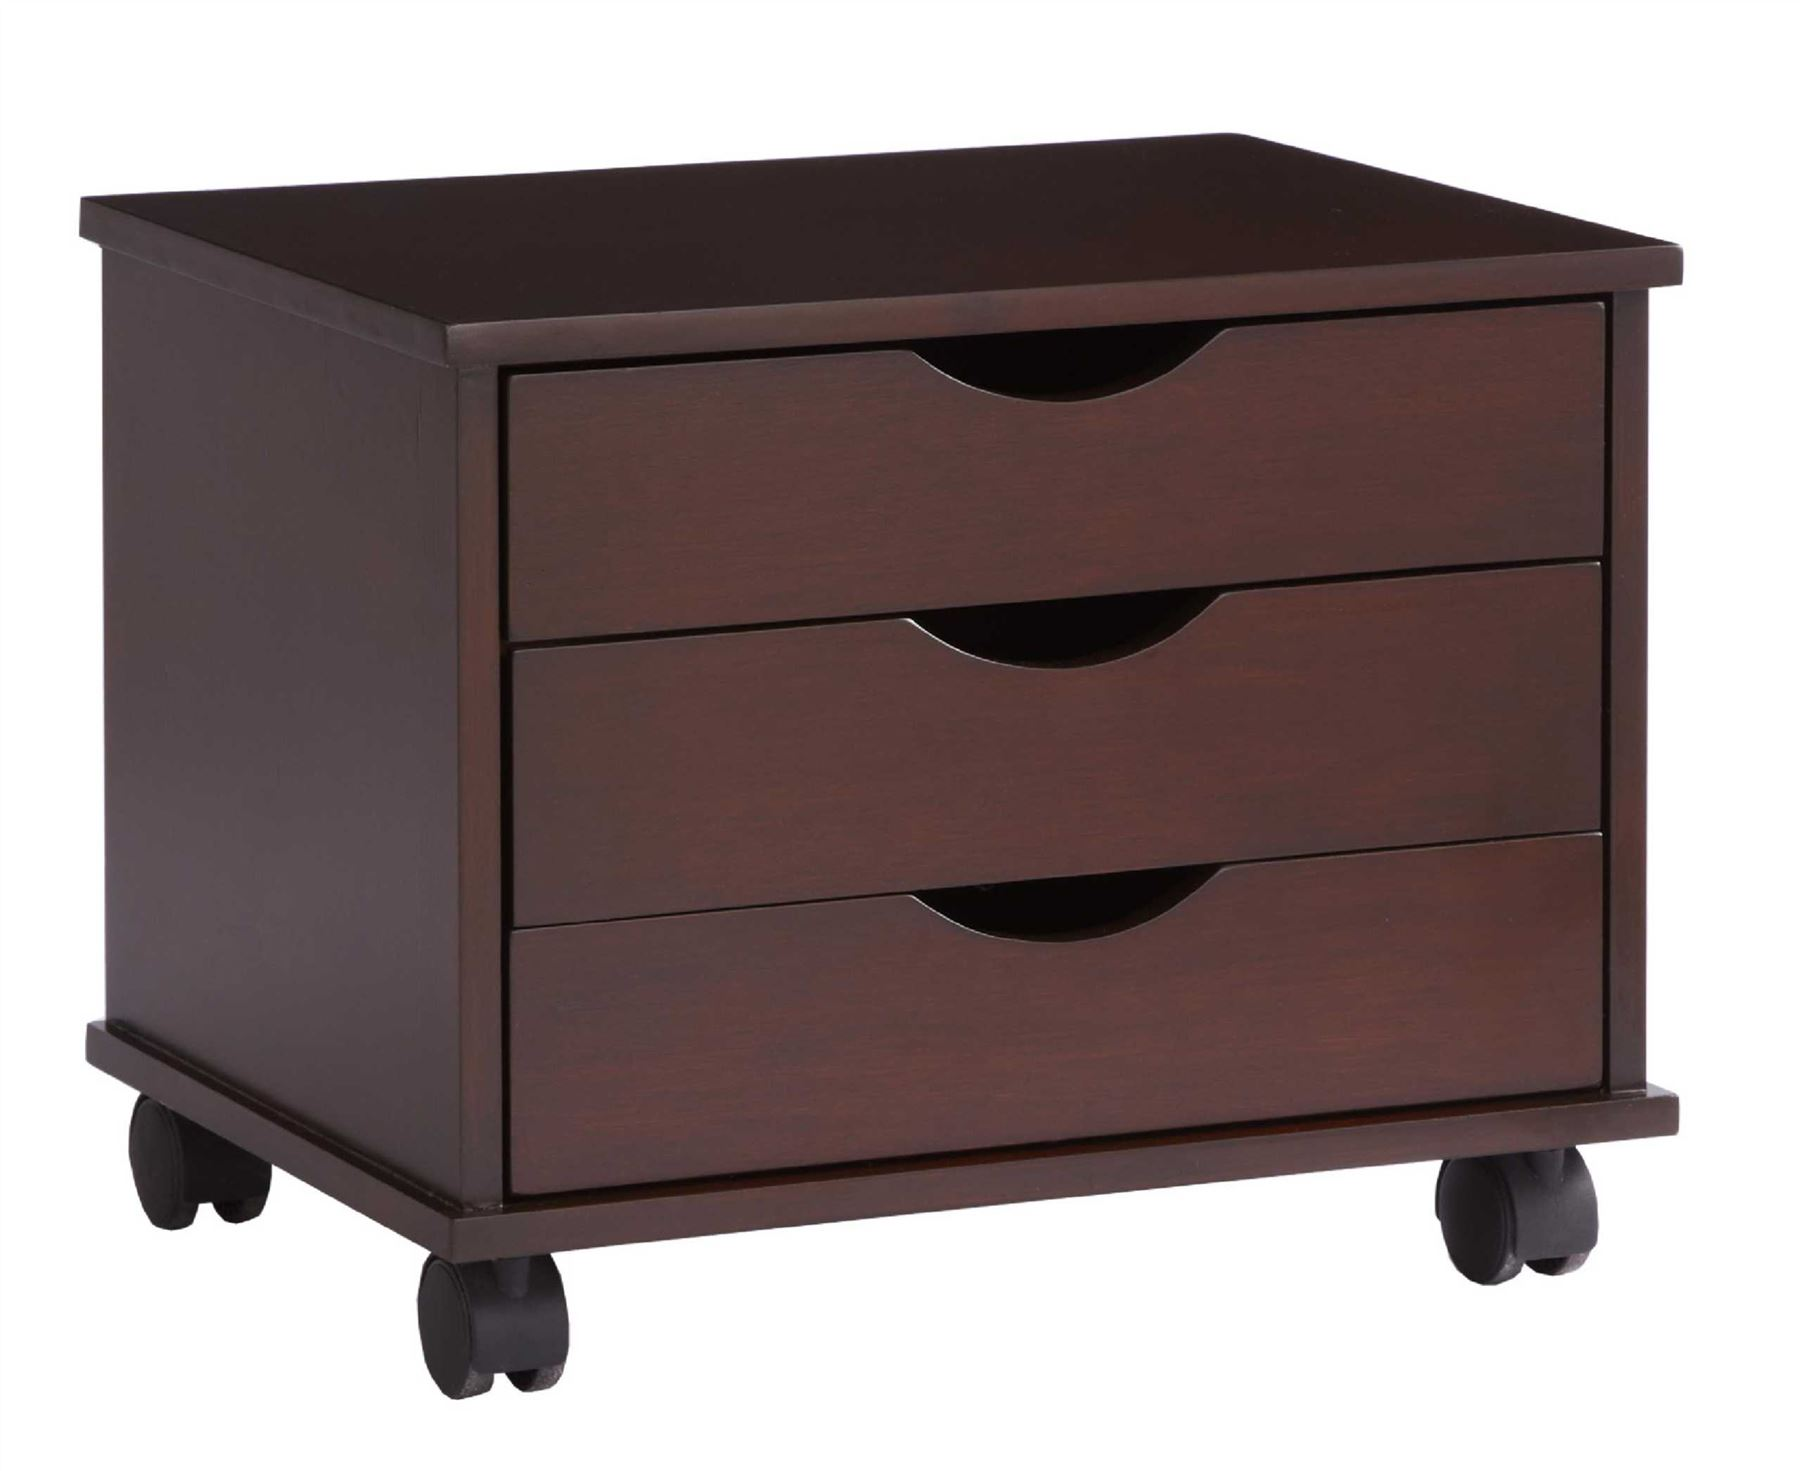 3 drawer Salisbury Storage Unit Rolling Home fice